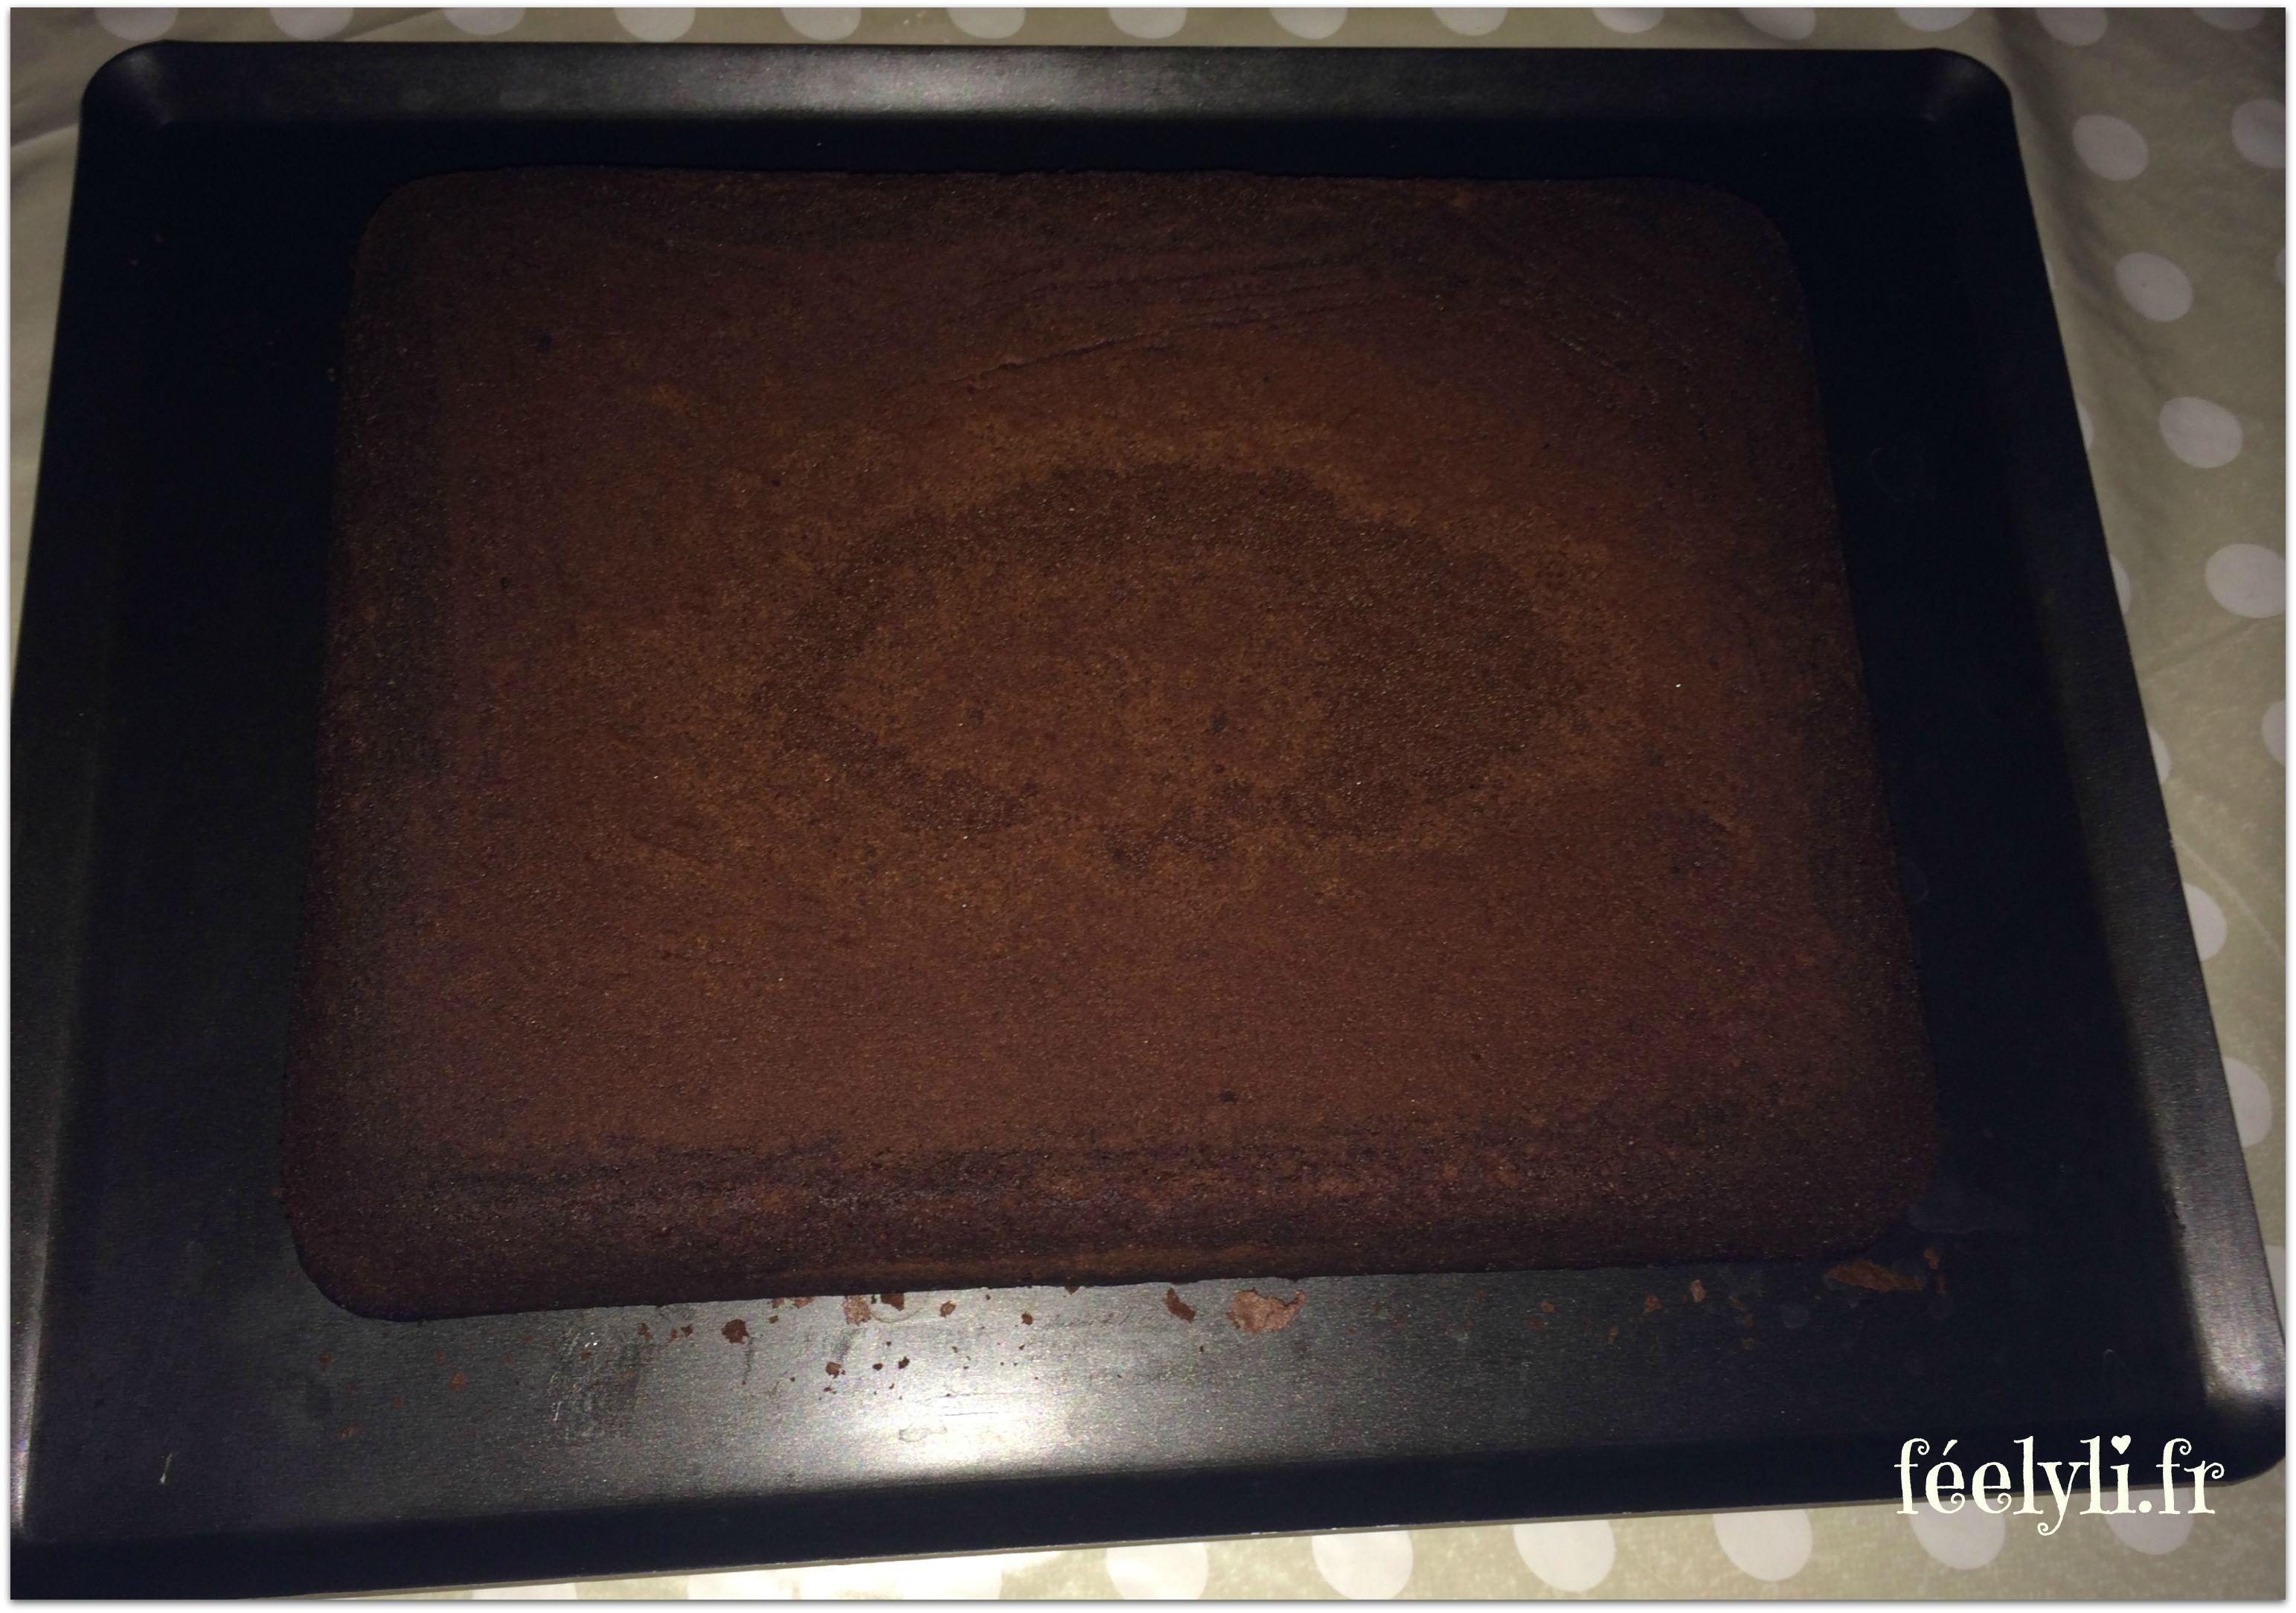 gâteau au chocolat rectangulaire